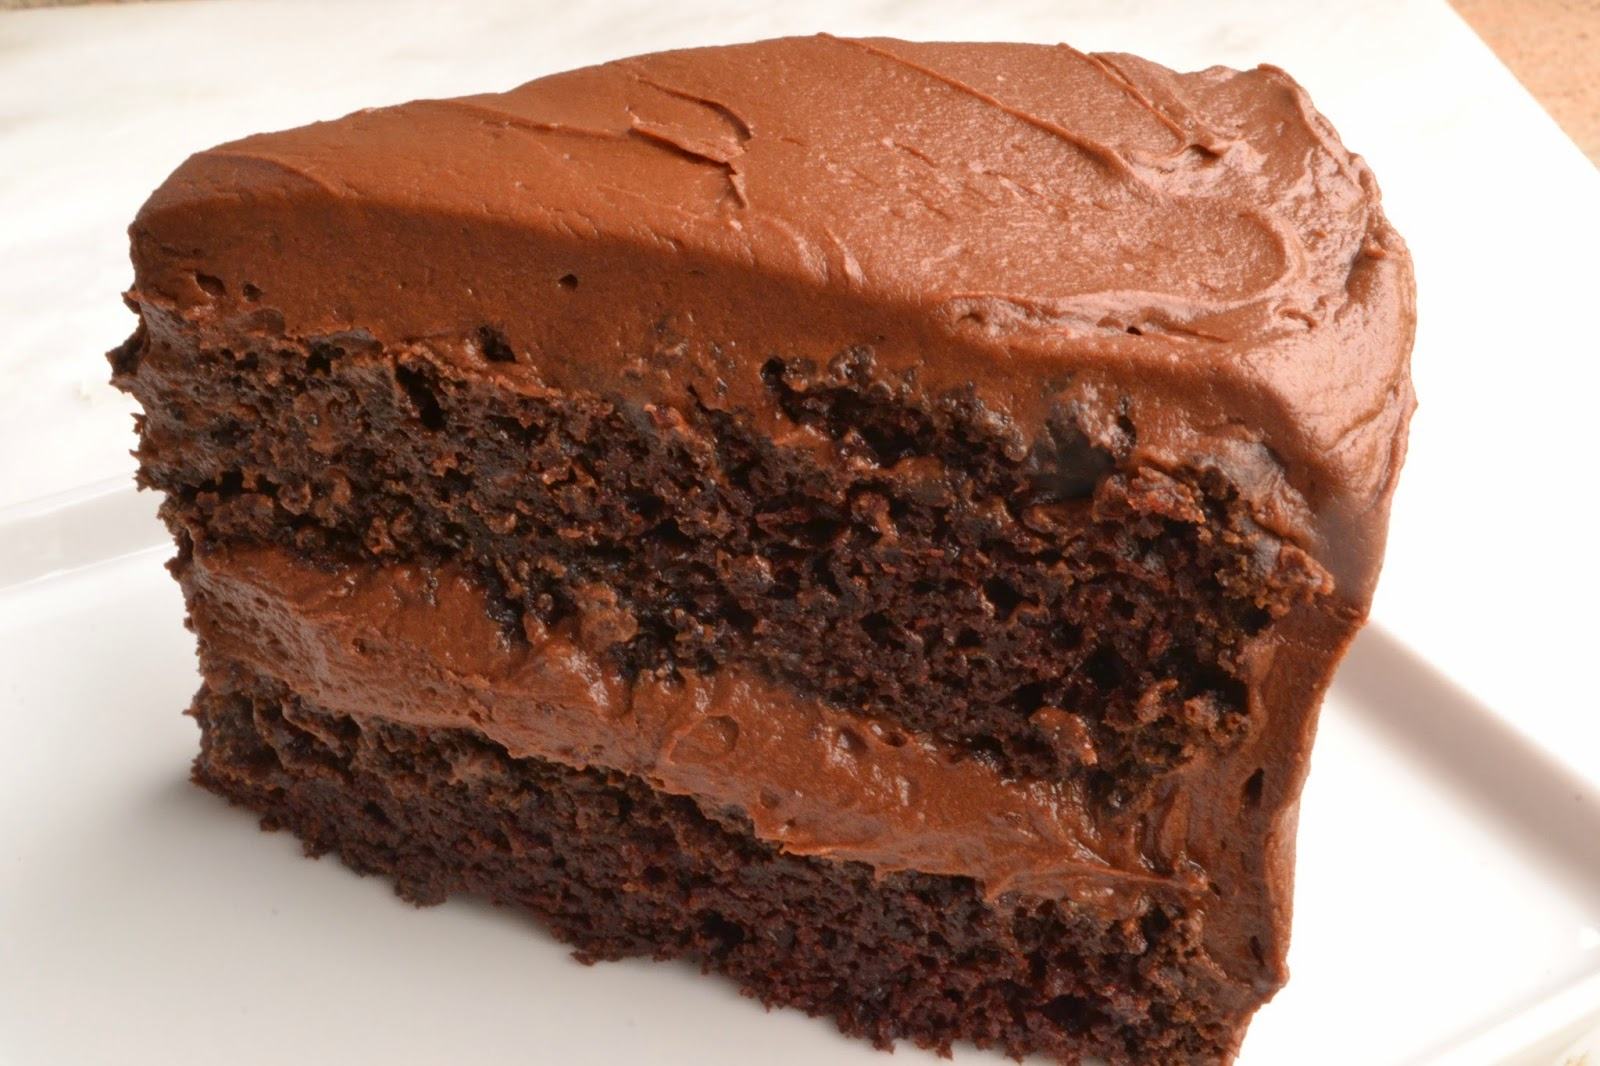 7kidsathome: Hershey's Deep Dark Chocolate Cake